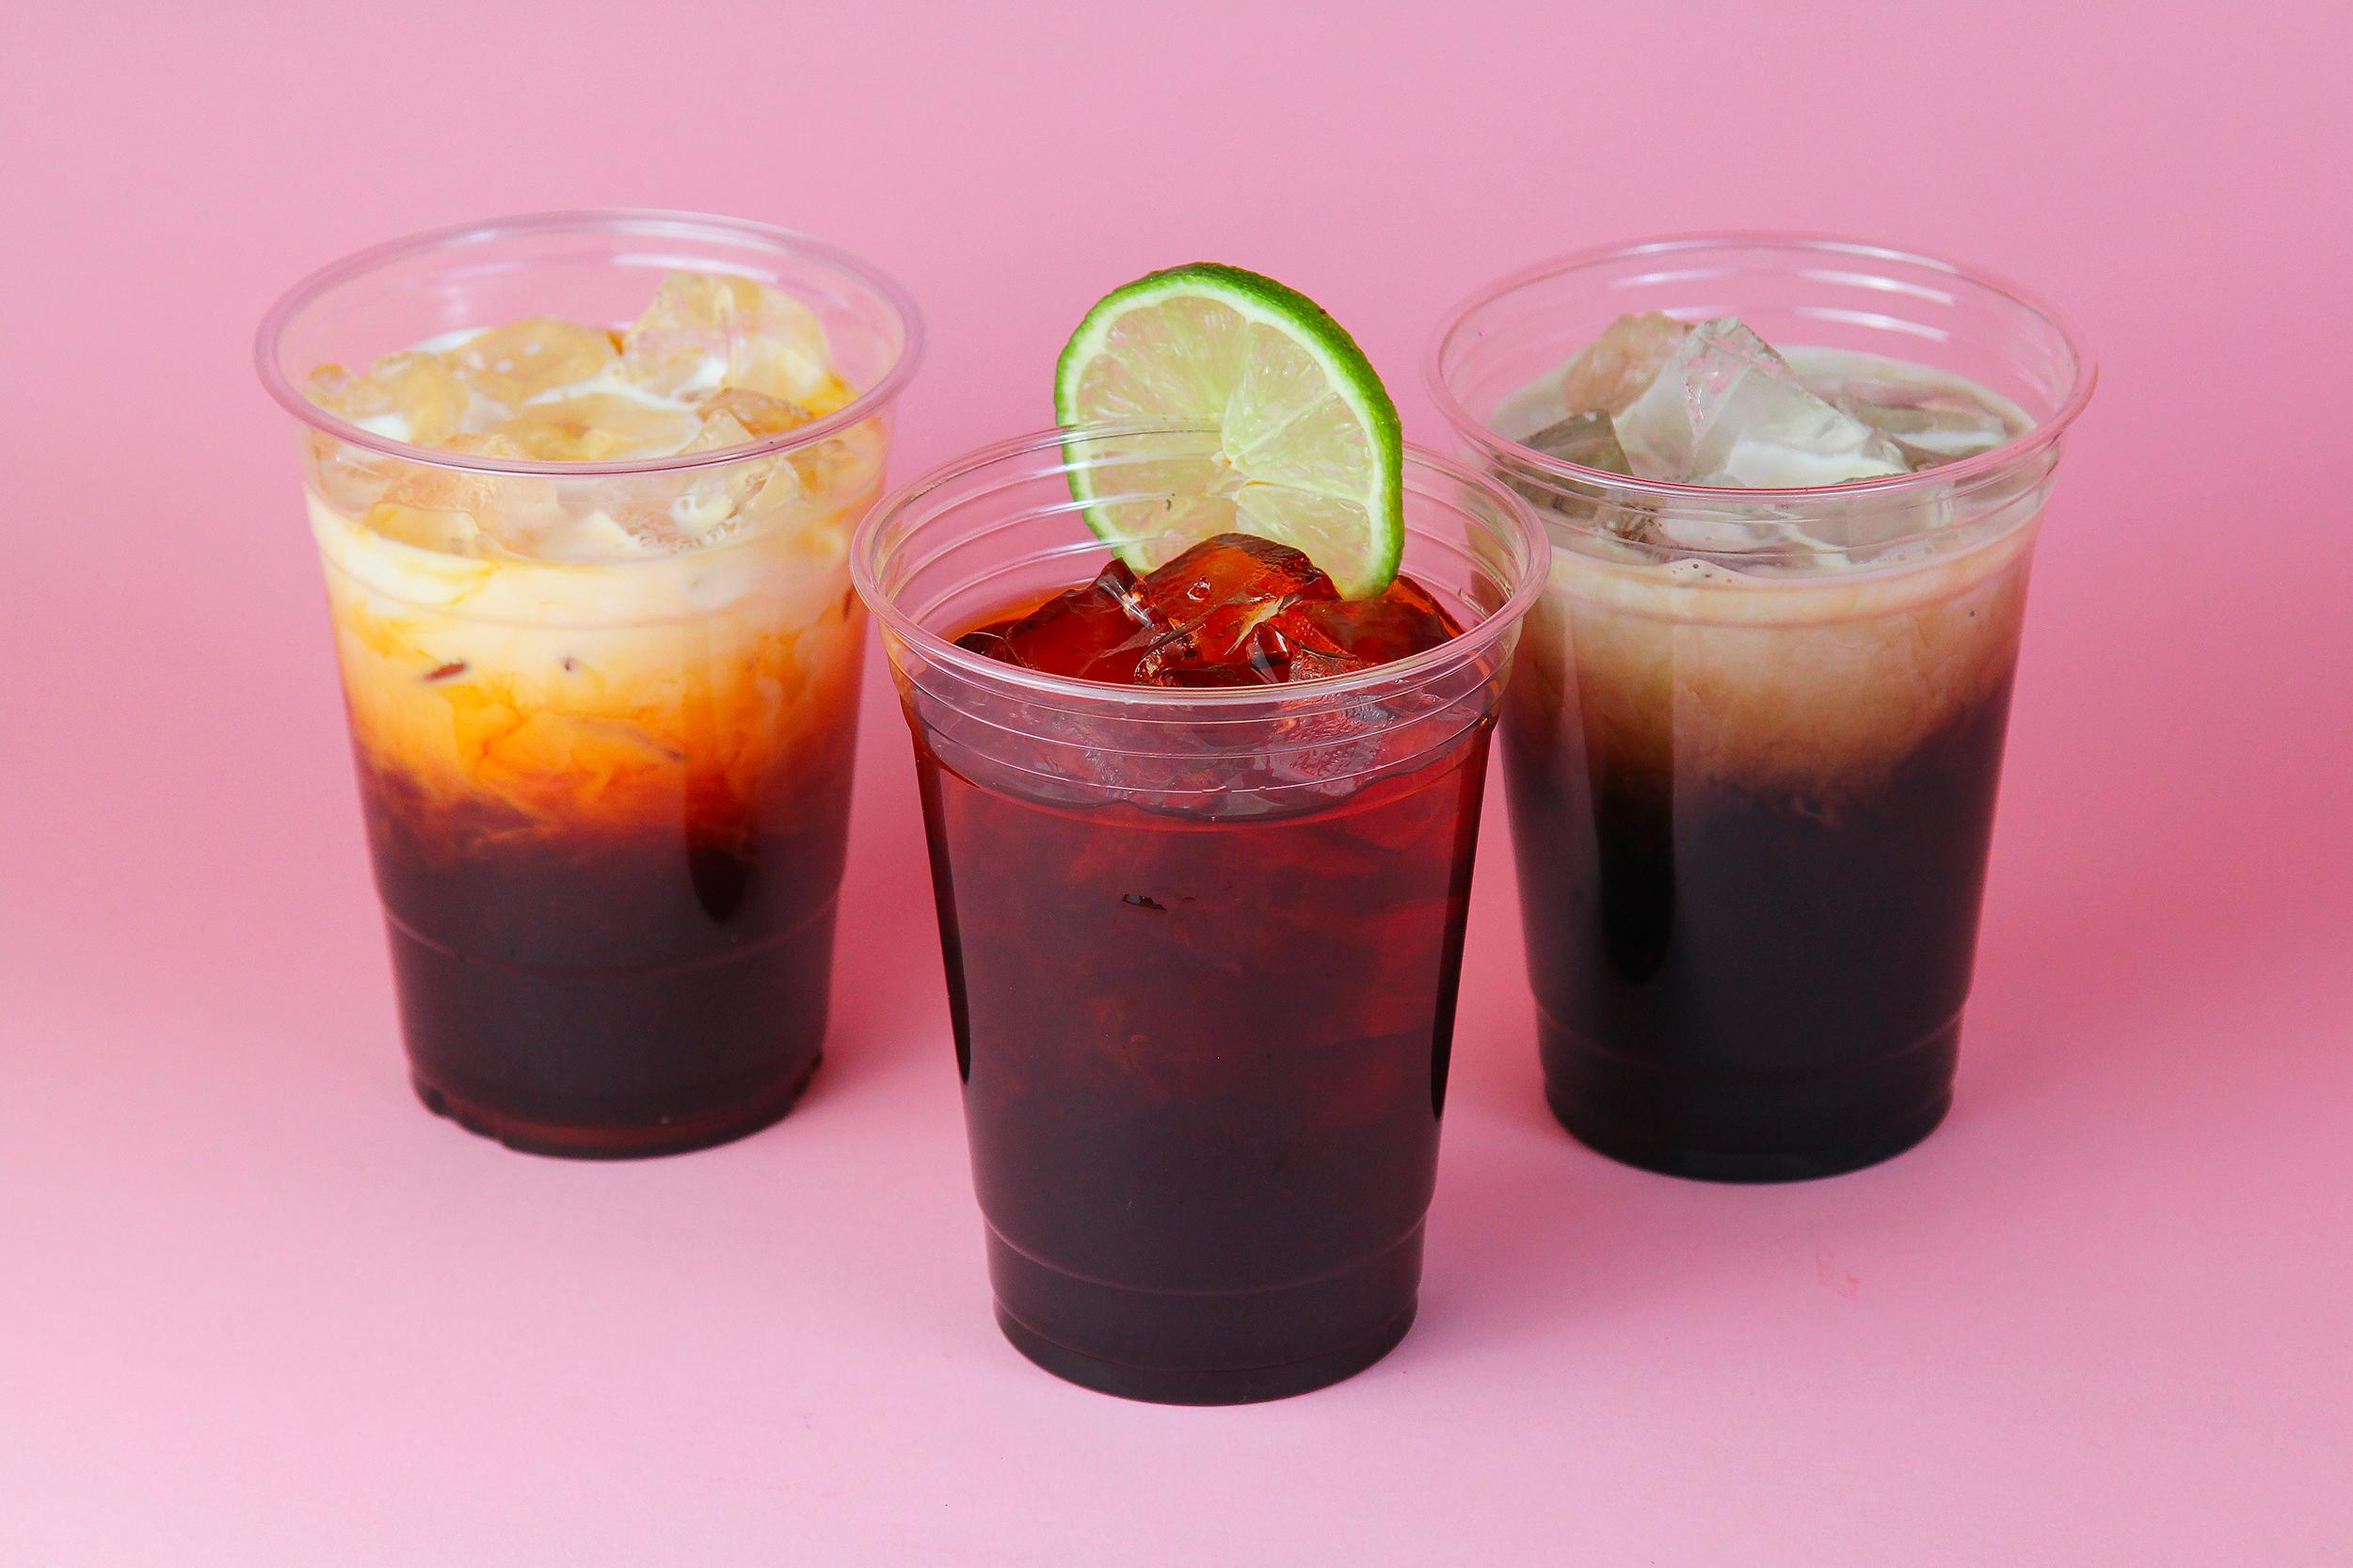 Thai Iced Tea  4   Thai Iced Tea with Lime  4   Thai Iced Coffee  4   Soda  2